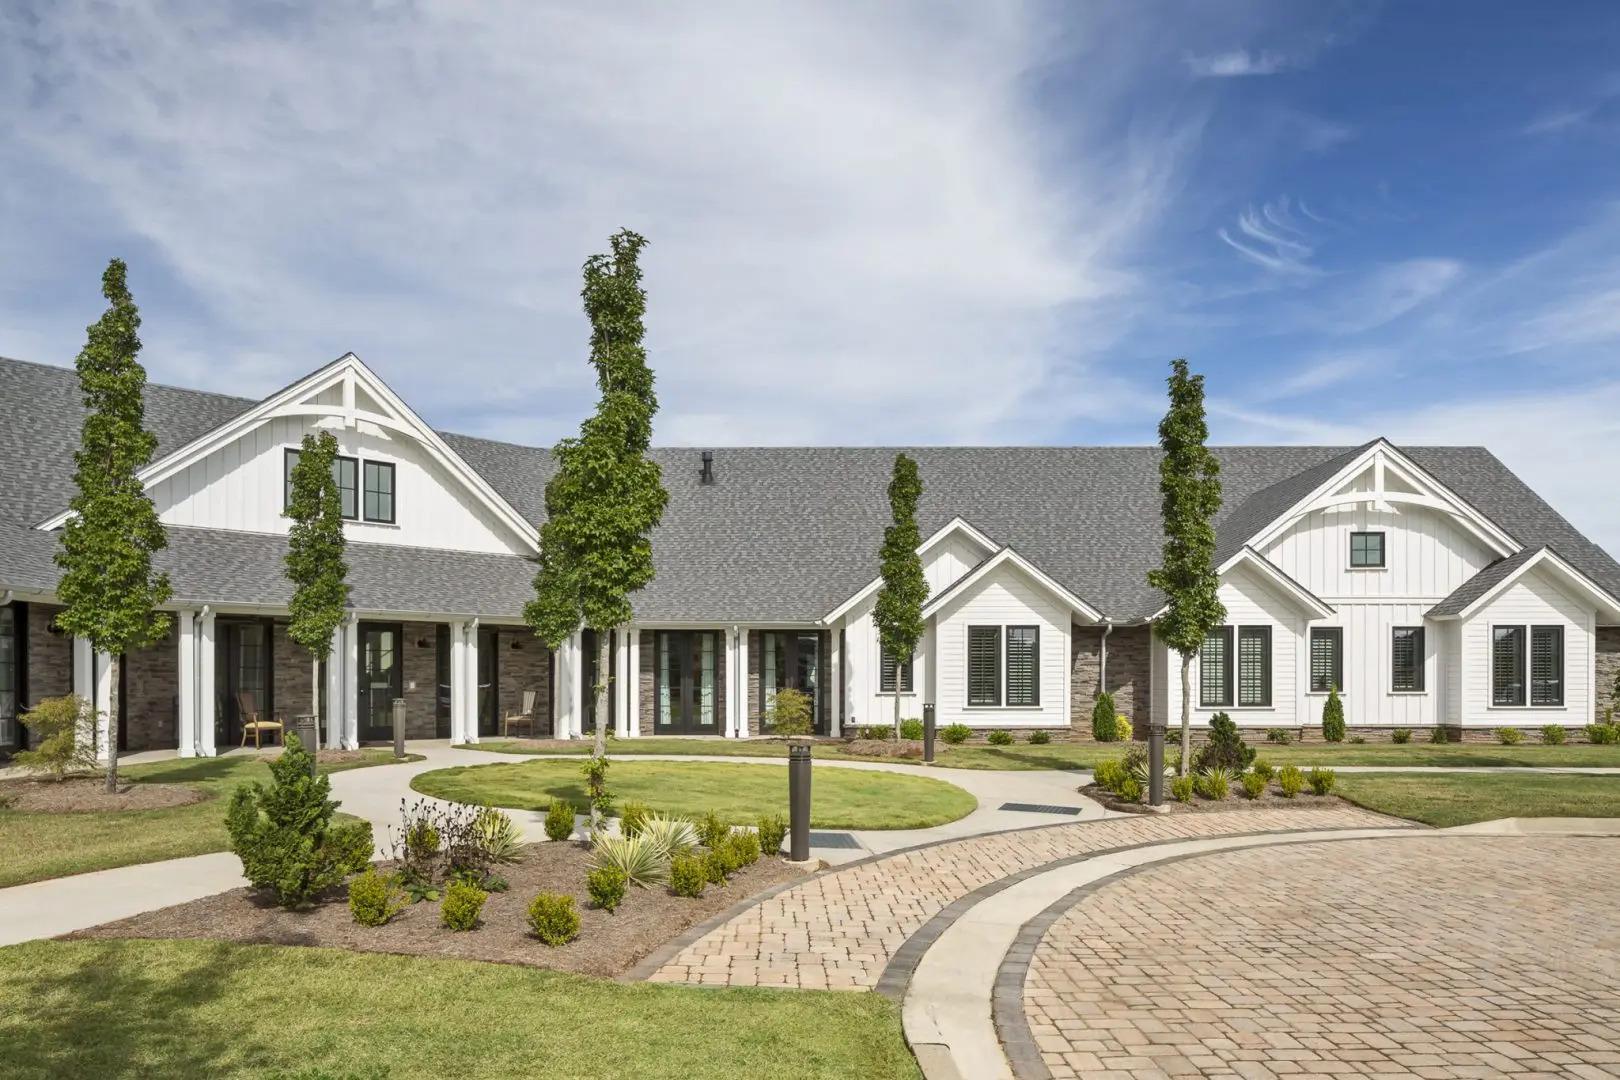 The Household Model for Assisted Living Design